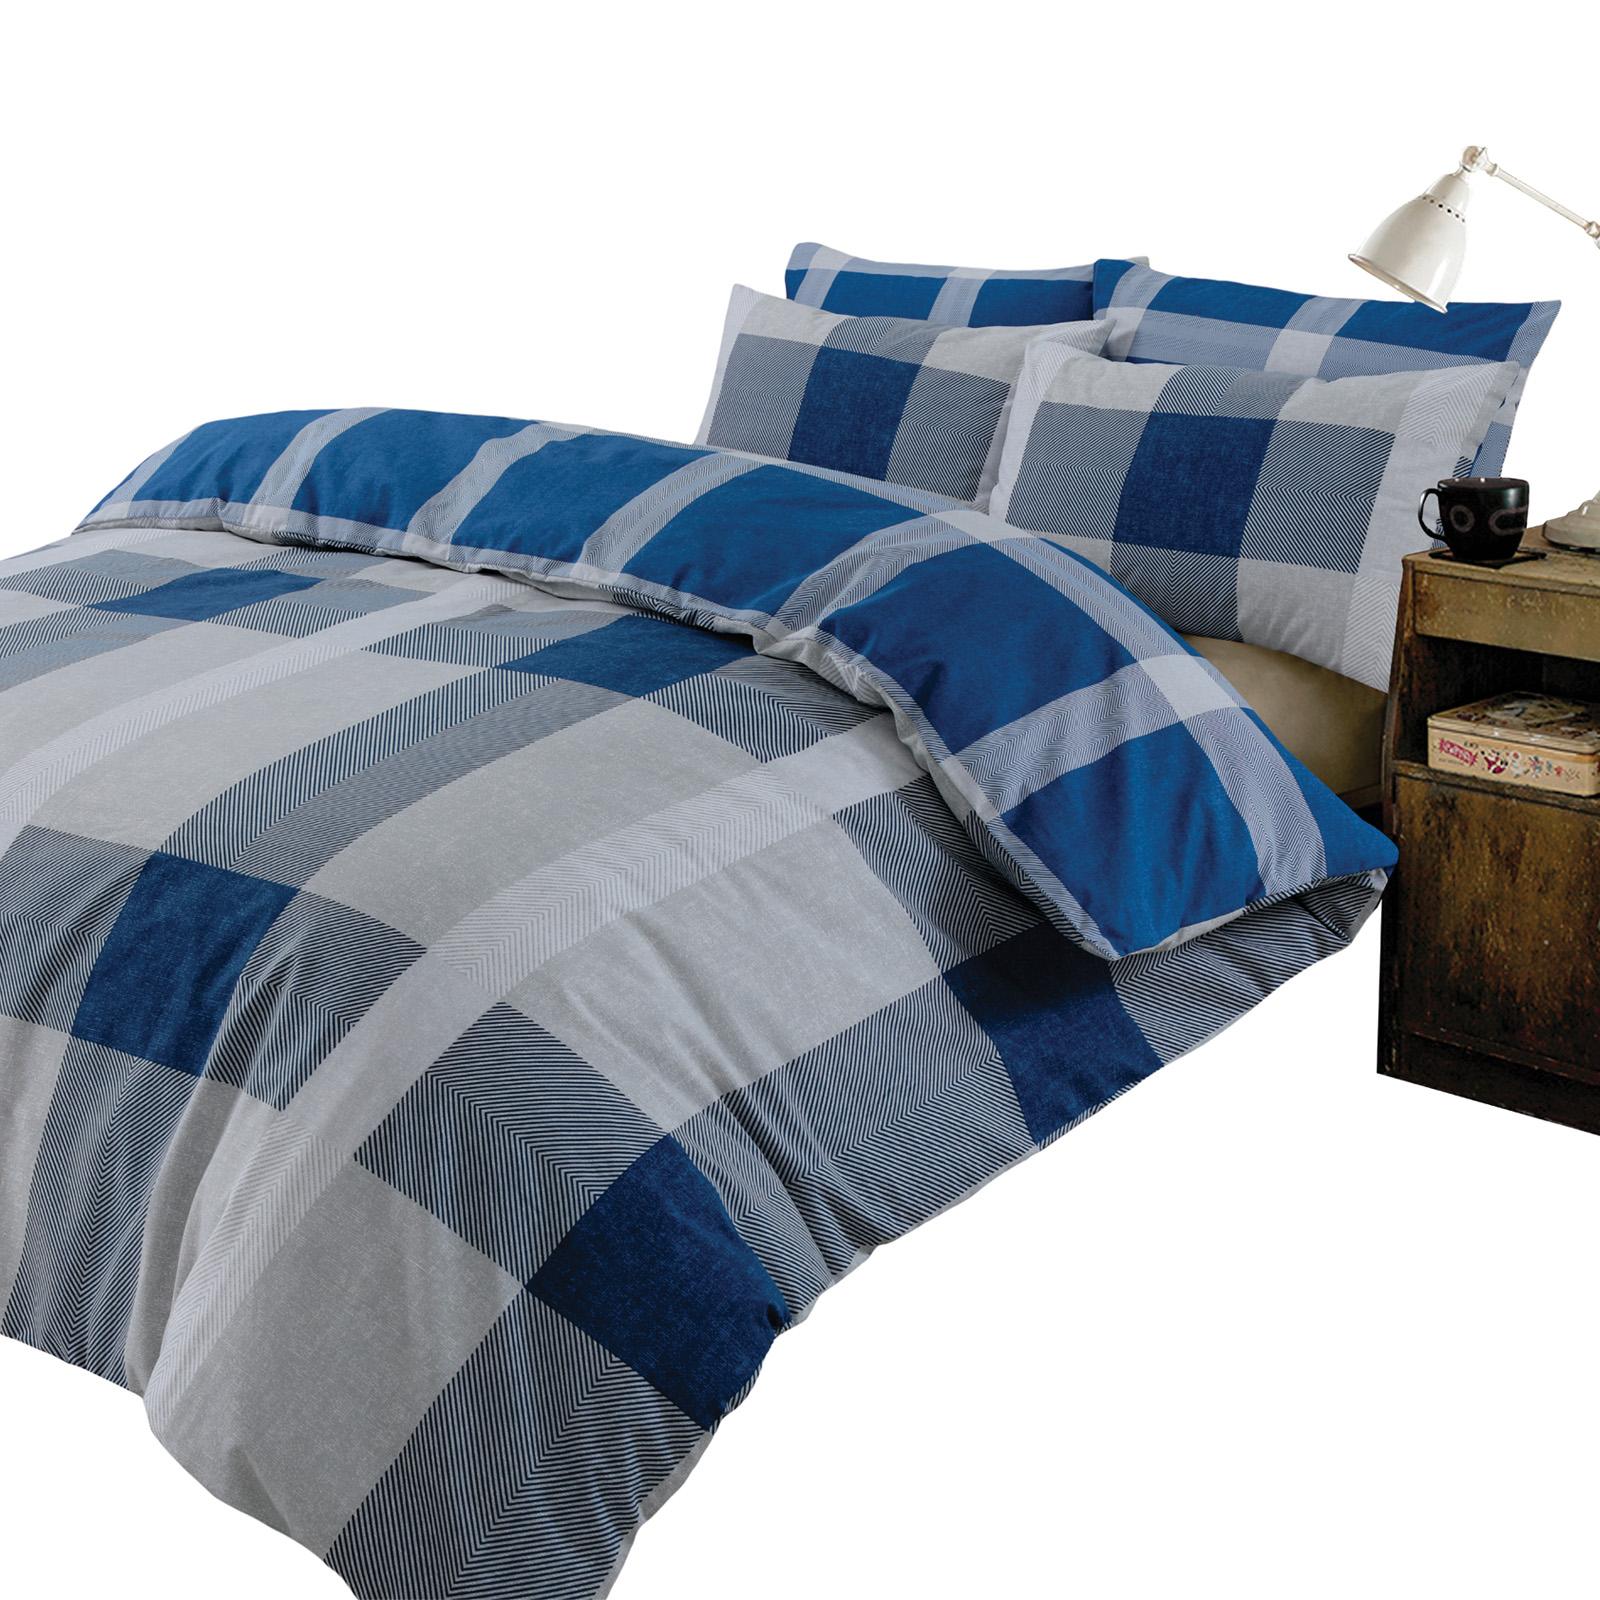 Dreamscene-Duvet-Cover-with-Pillowcase-Polycotton-Bedding-Set-Single-Double-King